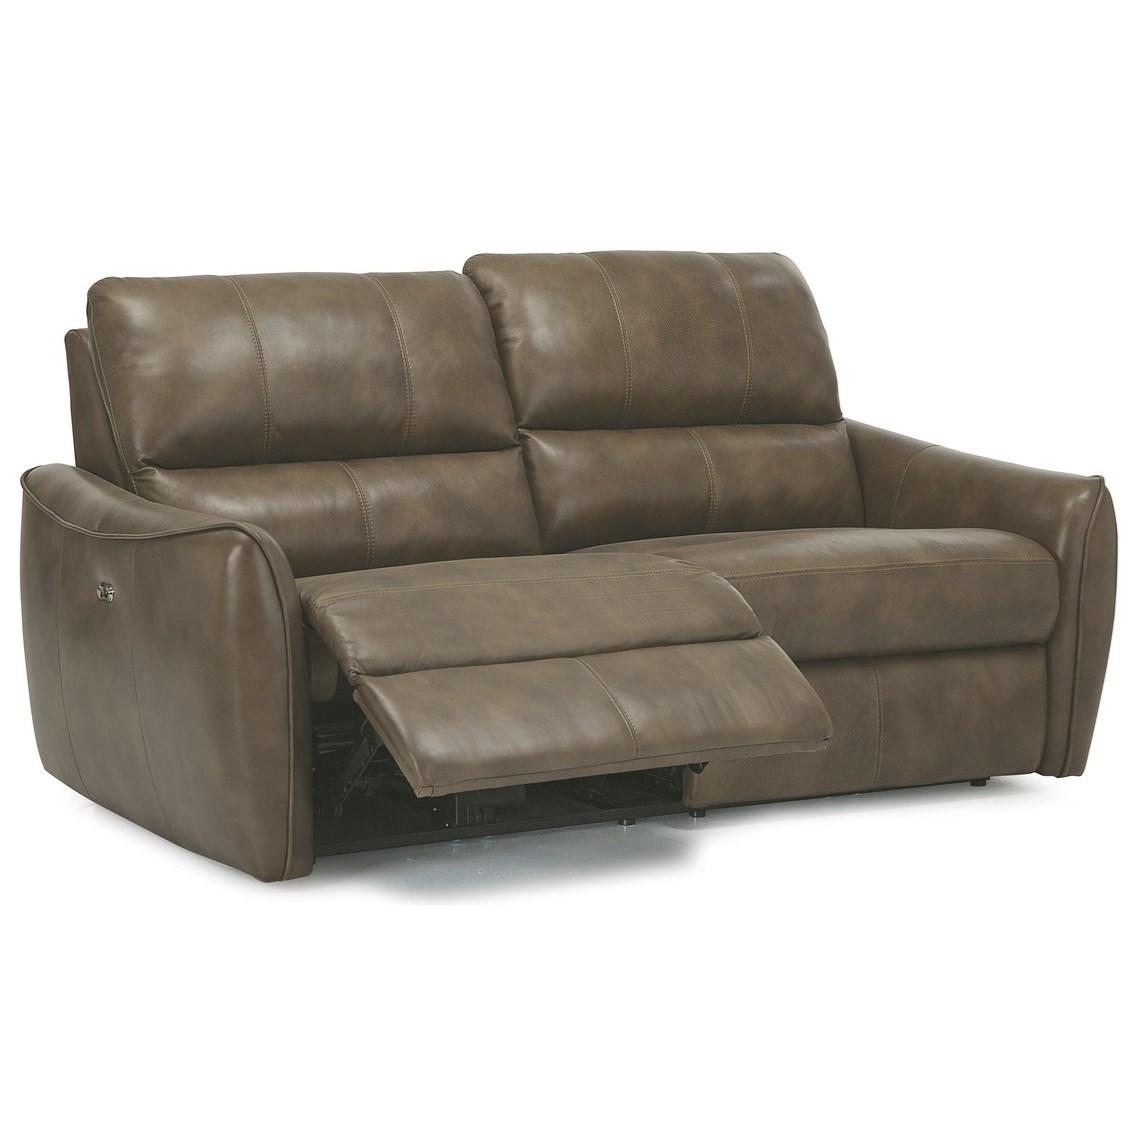 Palliser Arlo 41130 75 Contemporary Sofa Recliner With